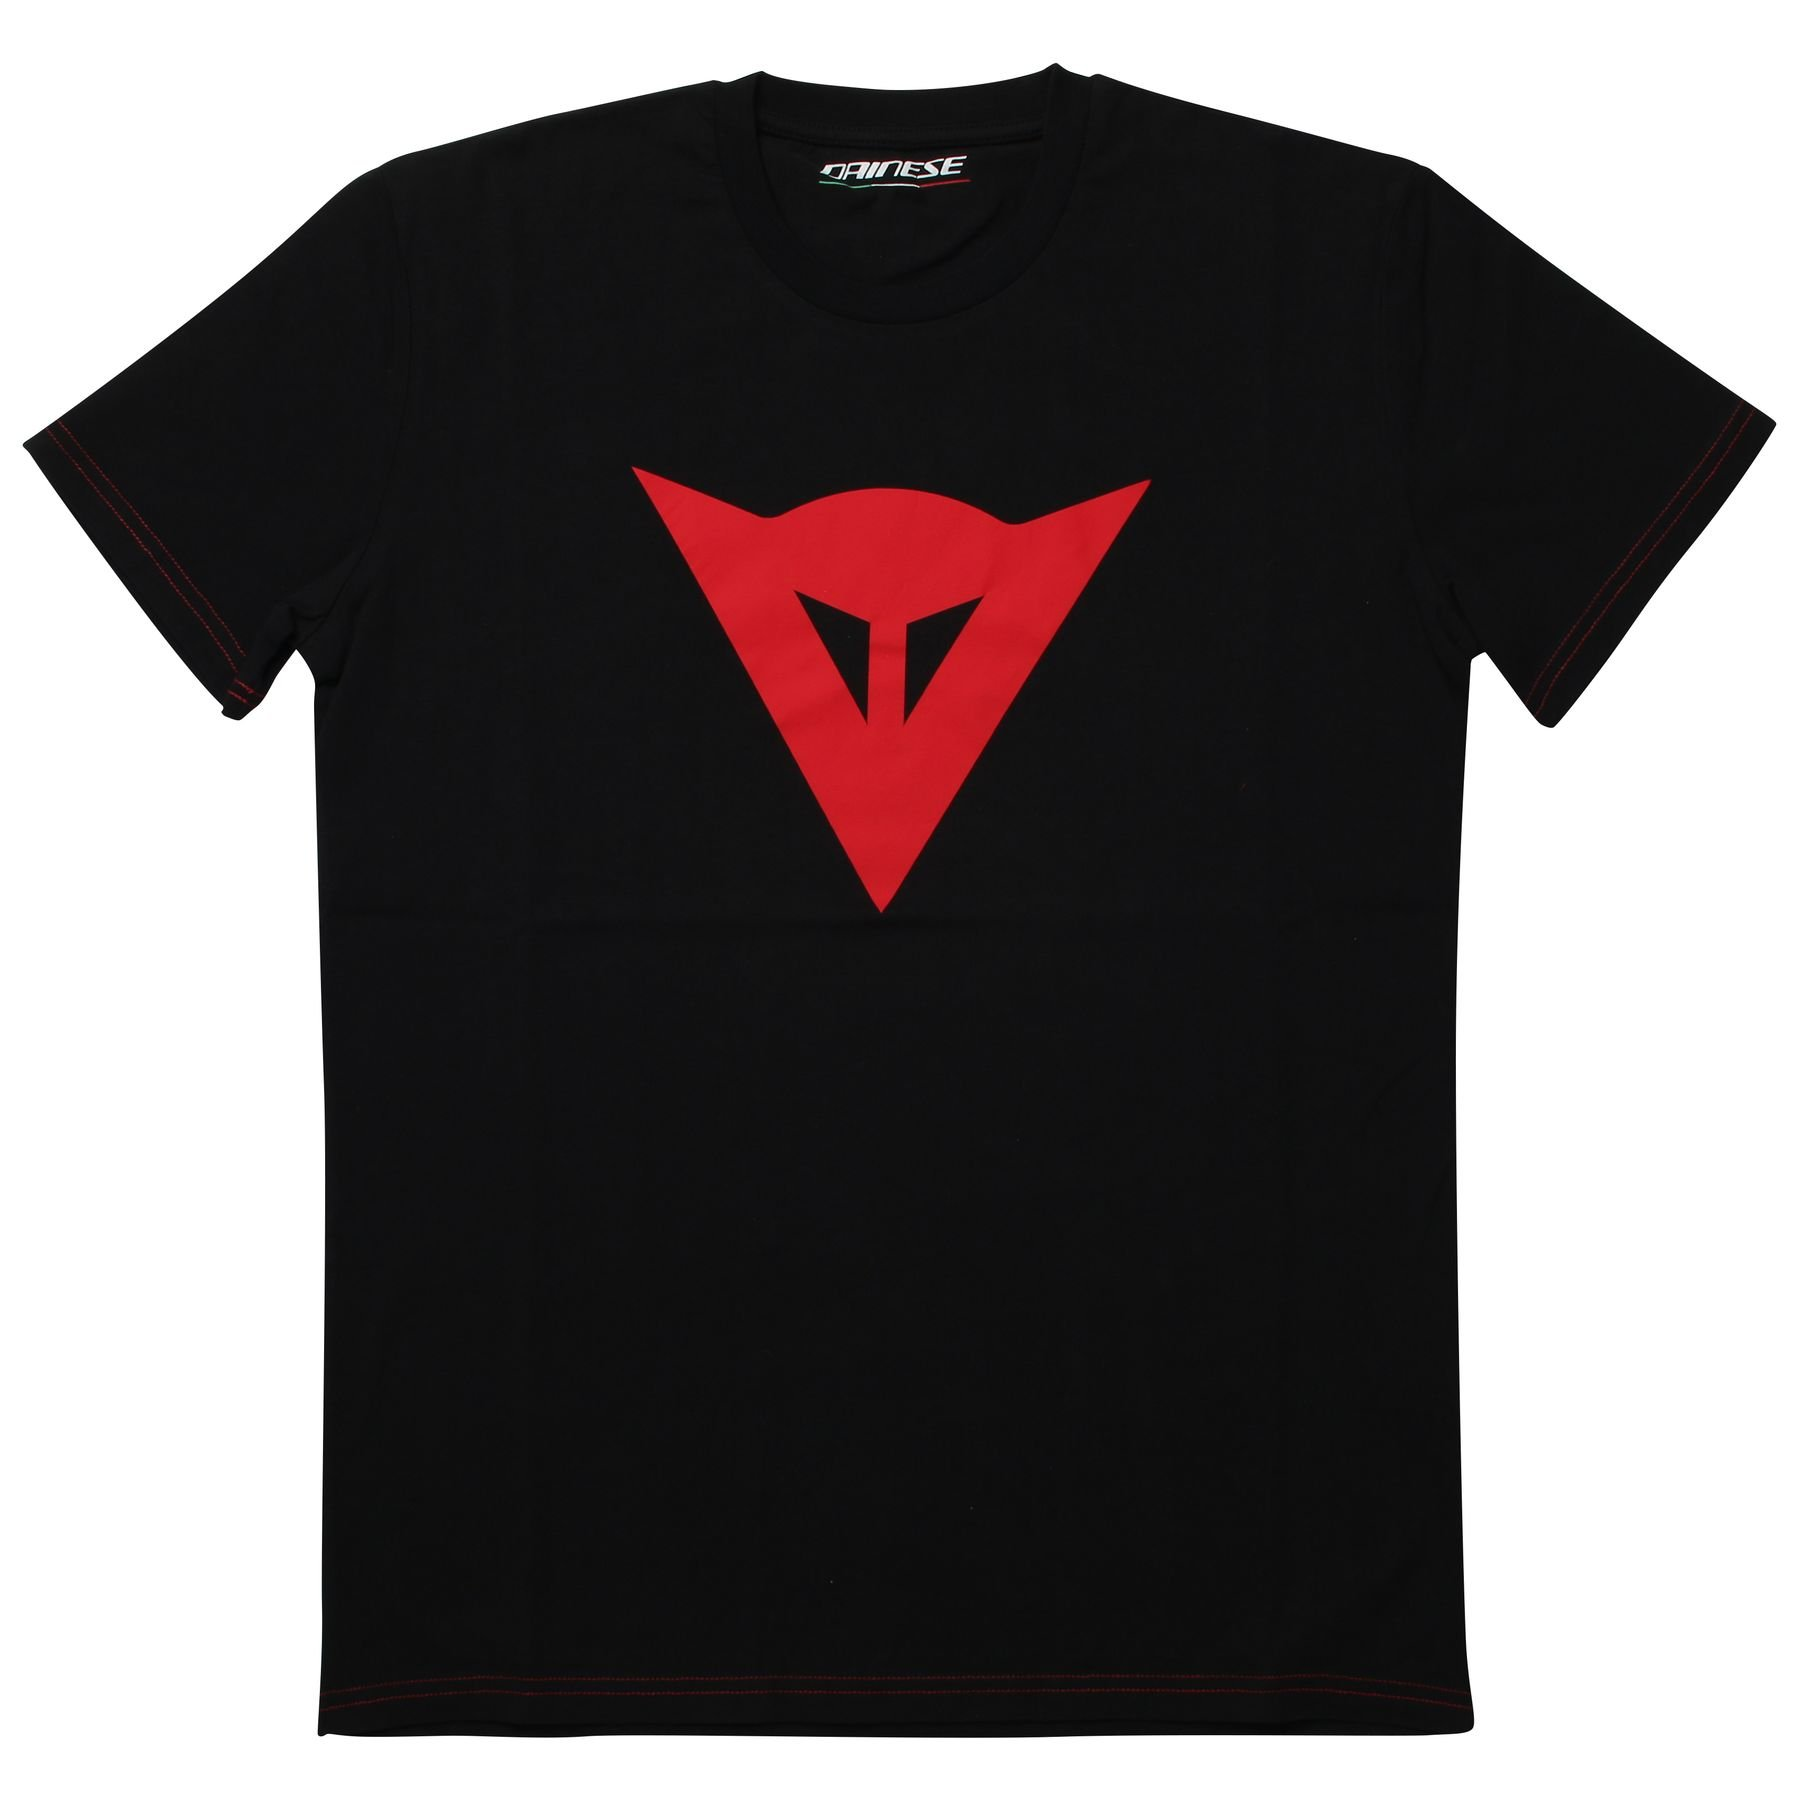 Dainese Men's SPEED DEMON T-SHIRT Black L